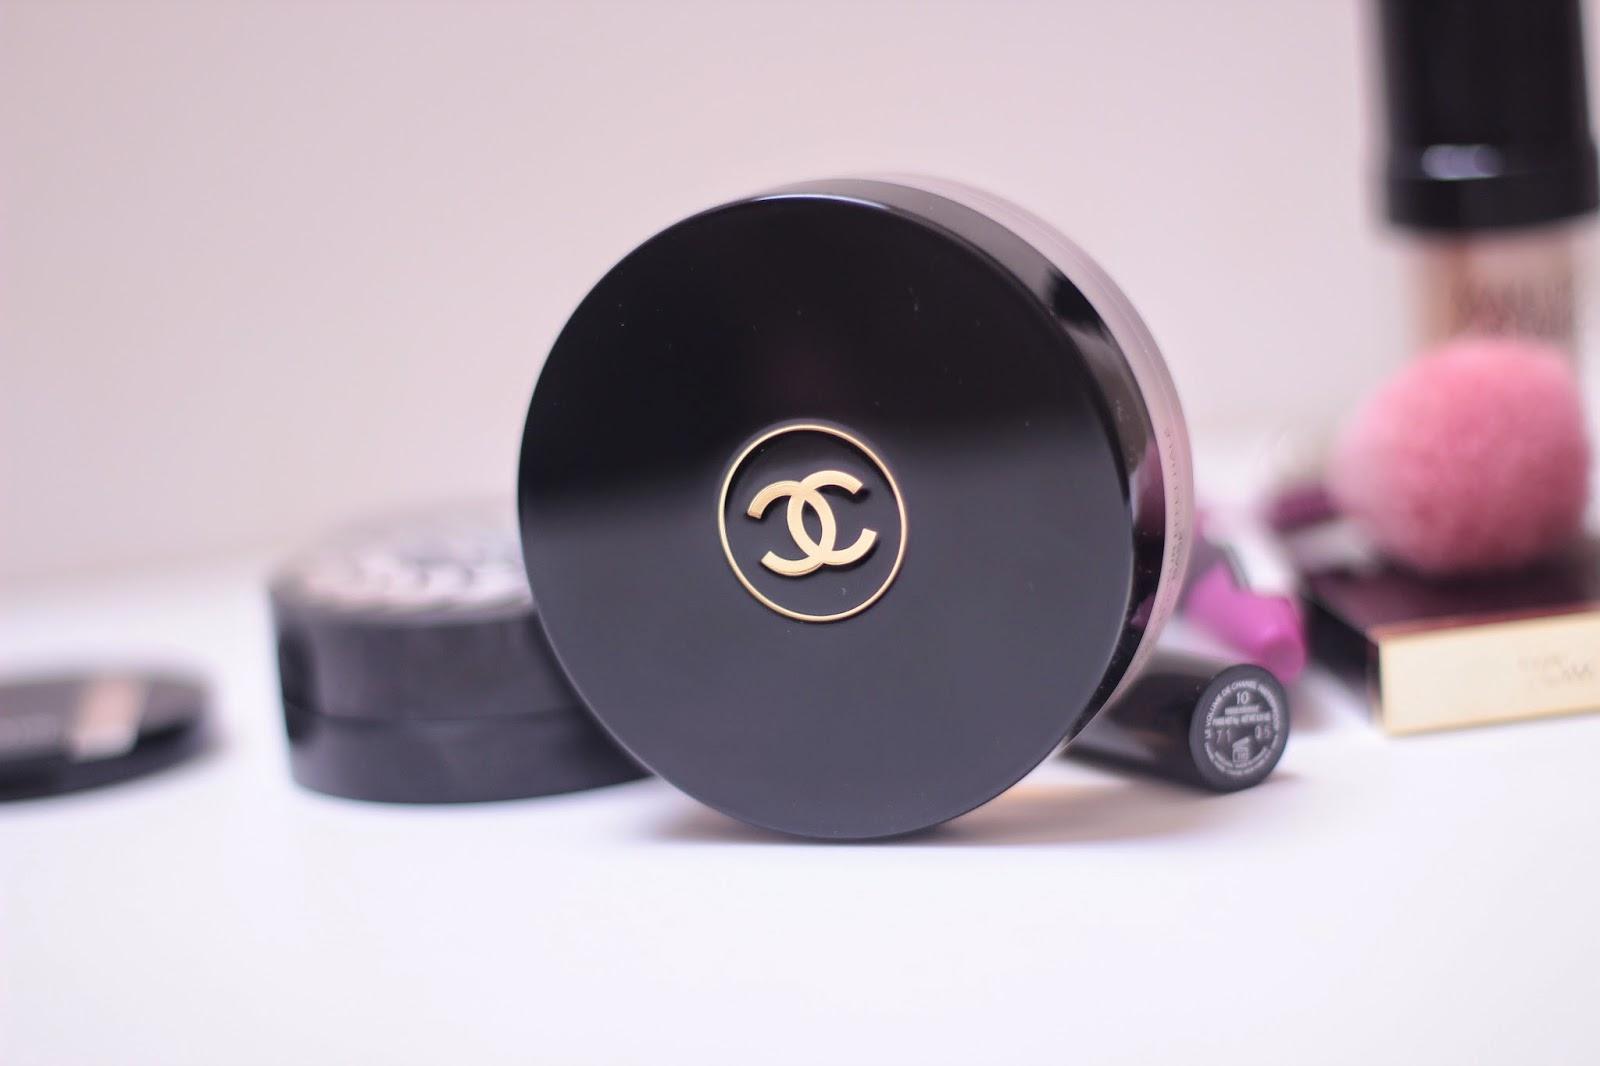 c35c44896 ريفيو : برونزر يونفيرسال من شانيل / Review : Soleil Tan de Chanel - Bronze  Universel